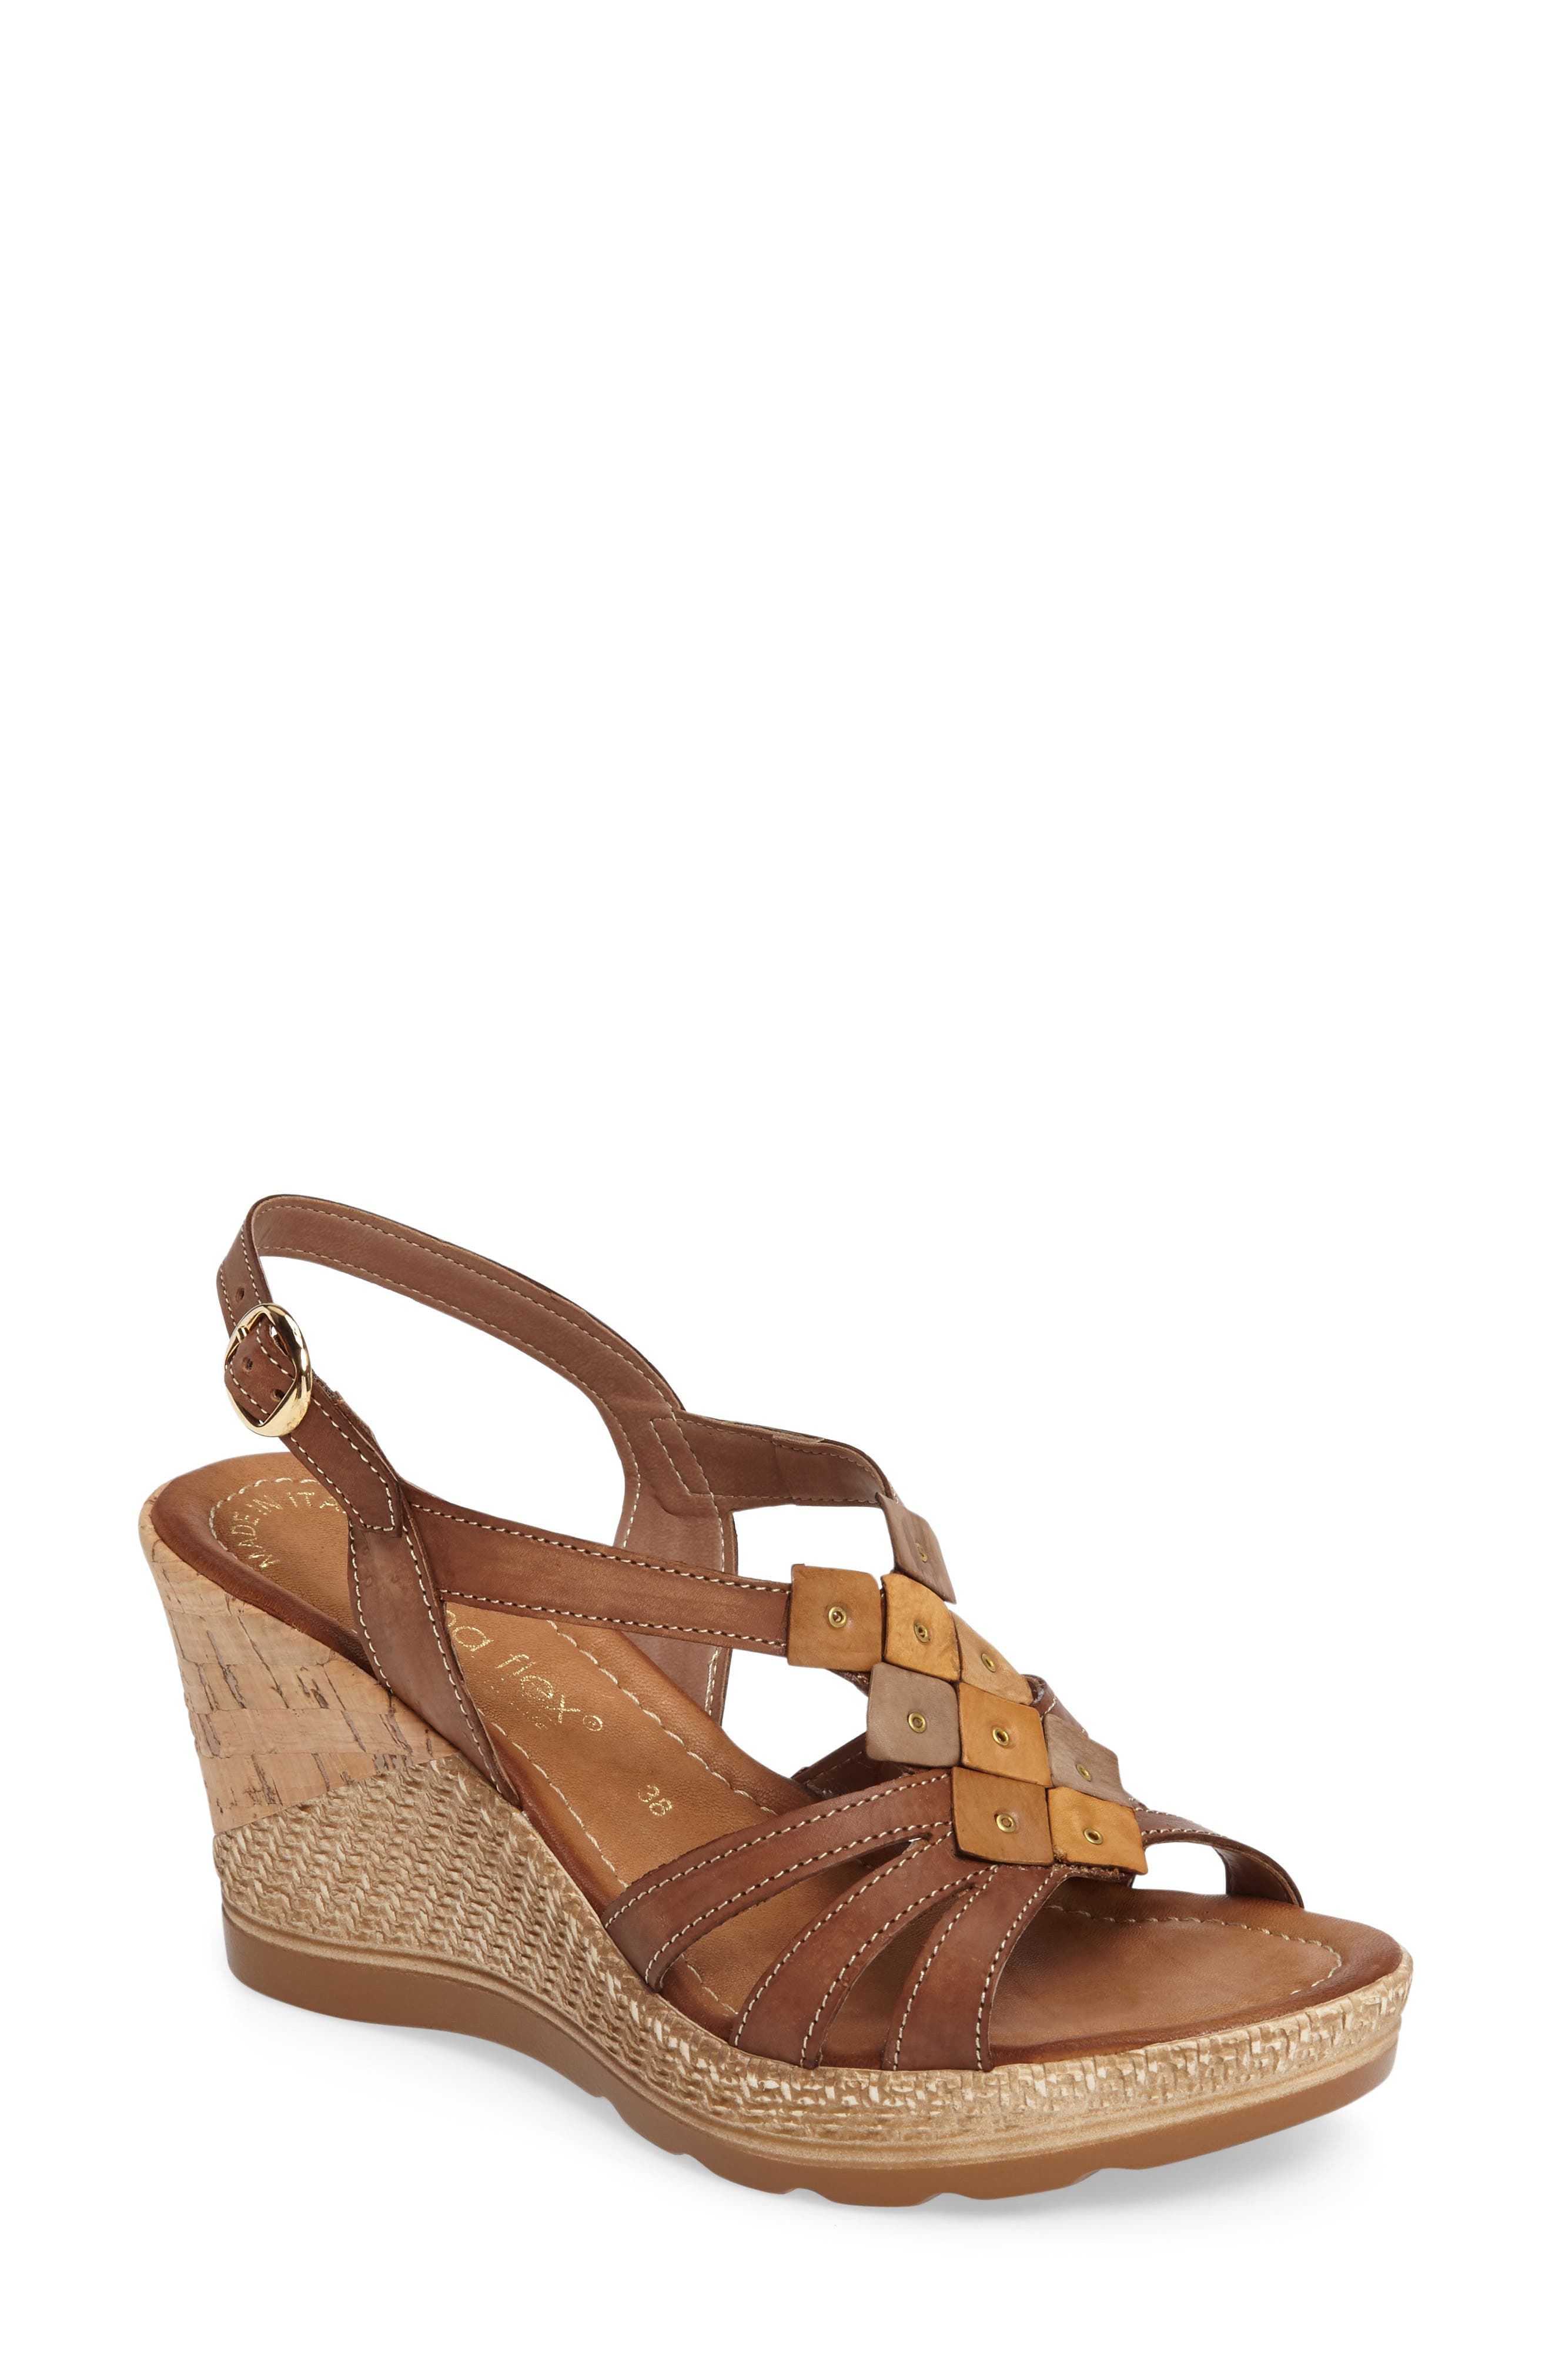 Alternate Image 1 Selected - Napa Flex Bari Wedge Sandal (Women)